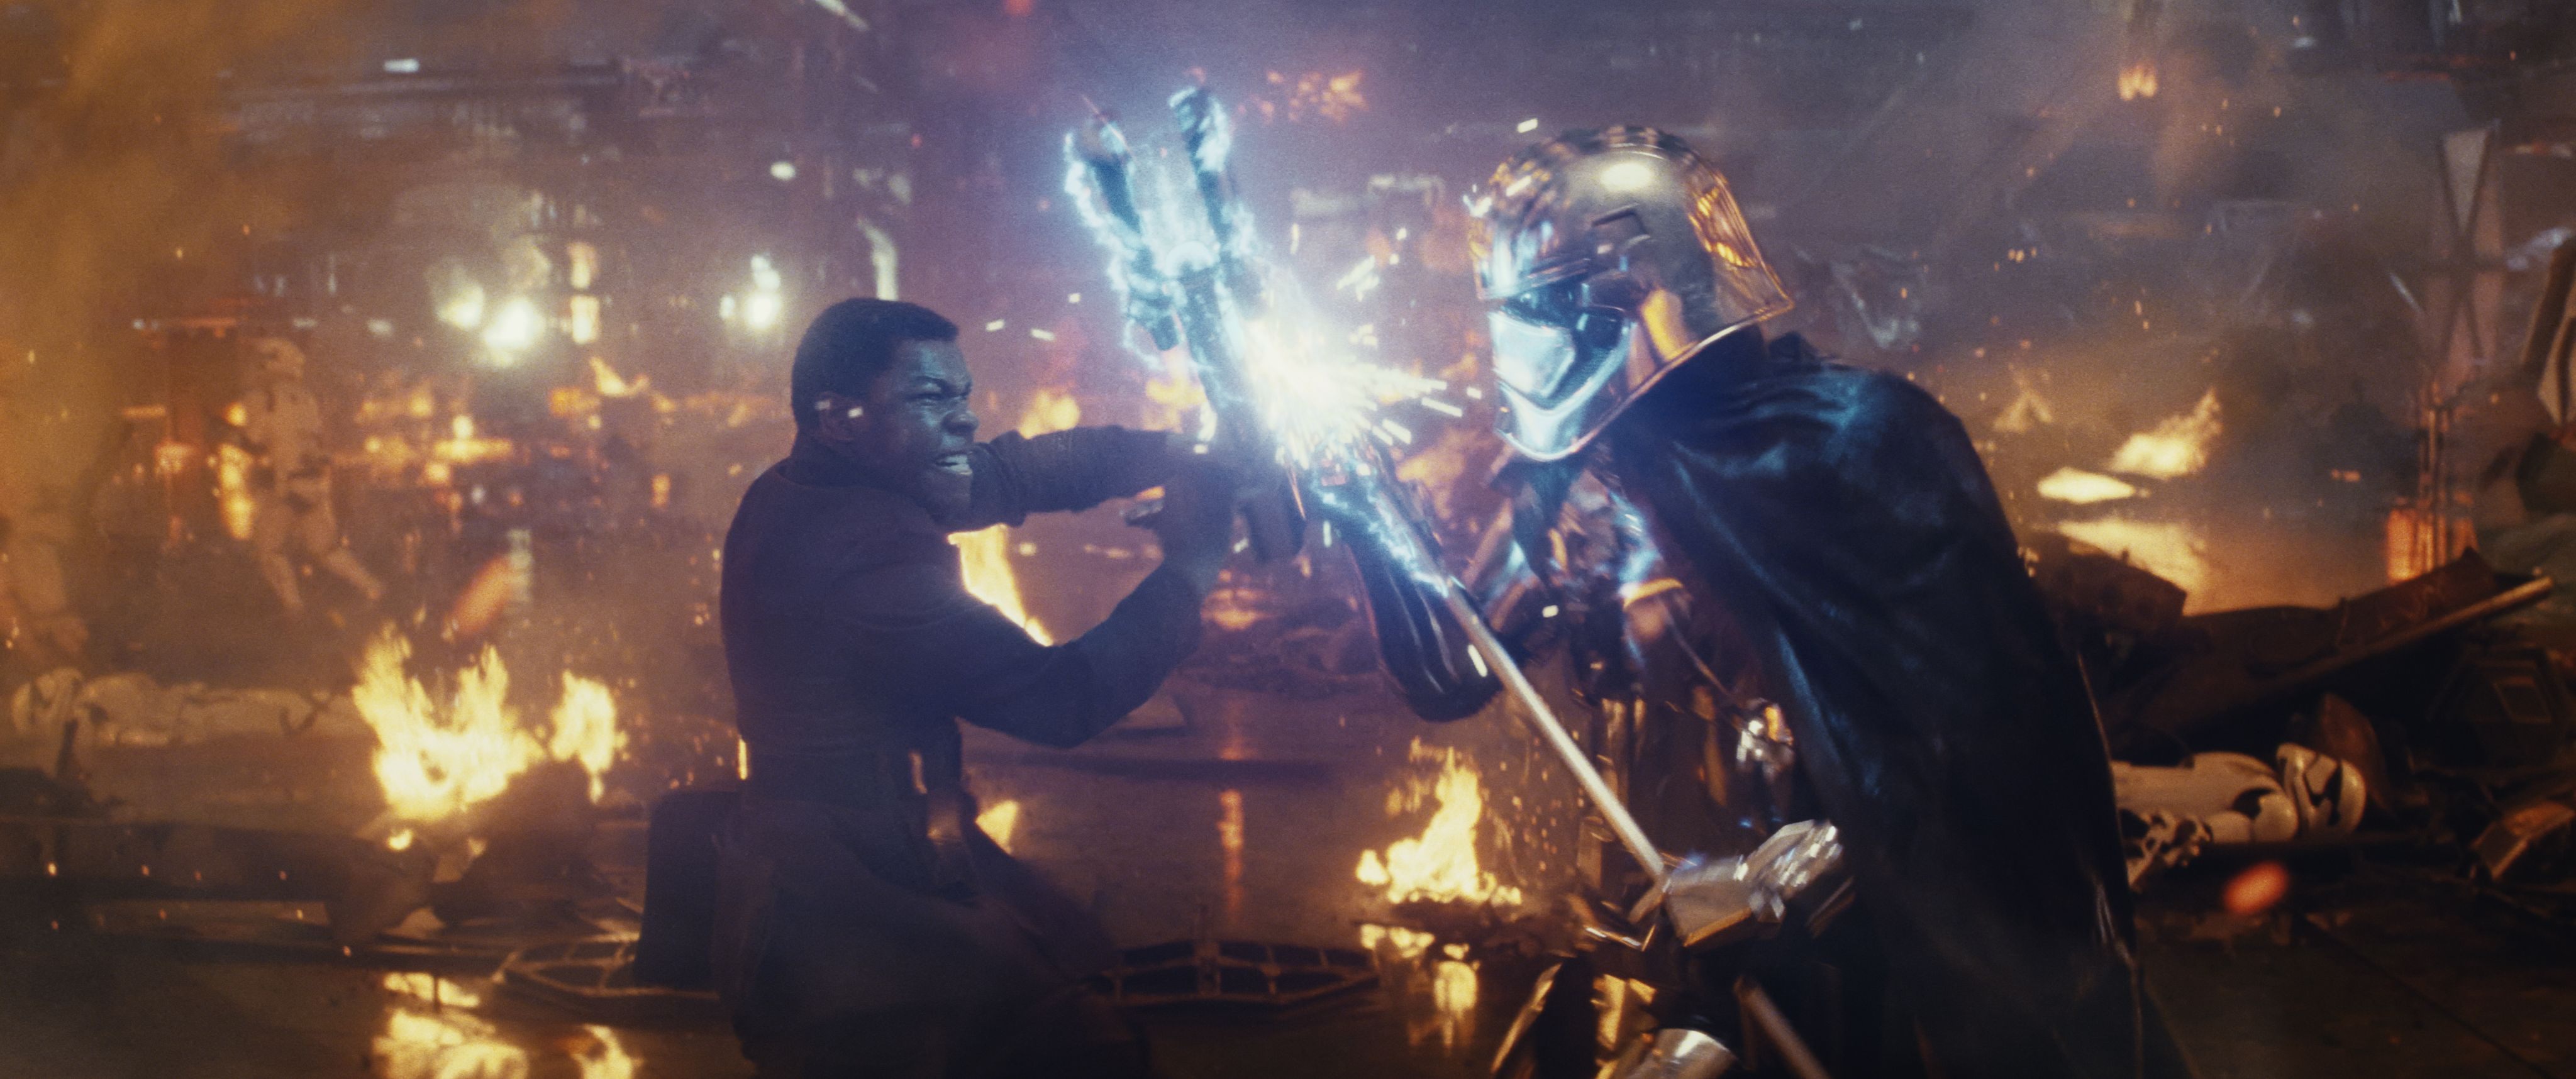 Movie Talk: New Star Wars: The Last Jedi Trailer Debuts ... - photo#11